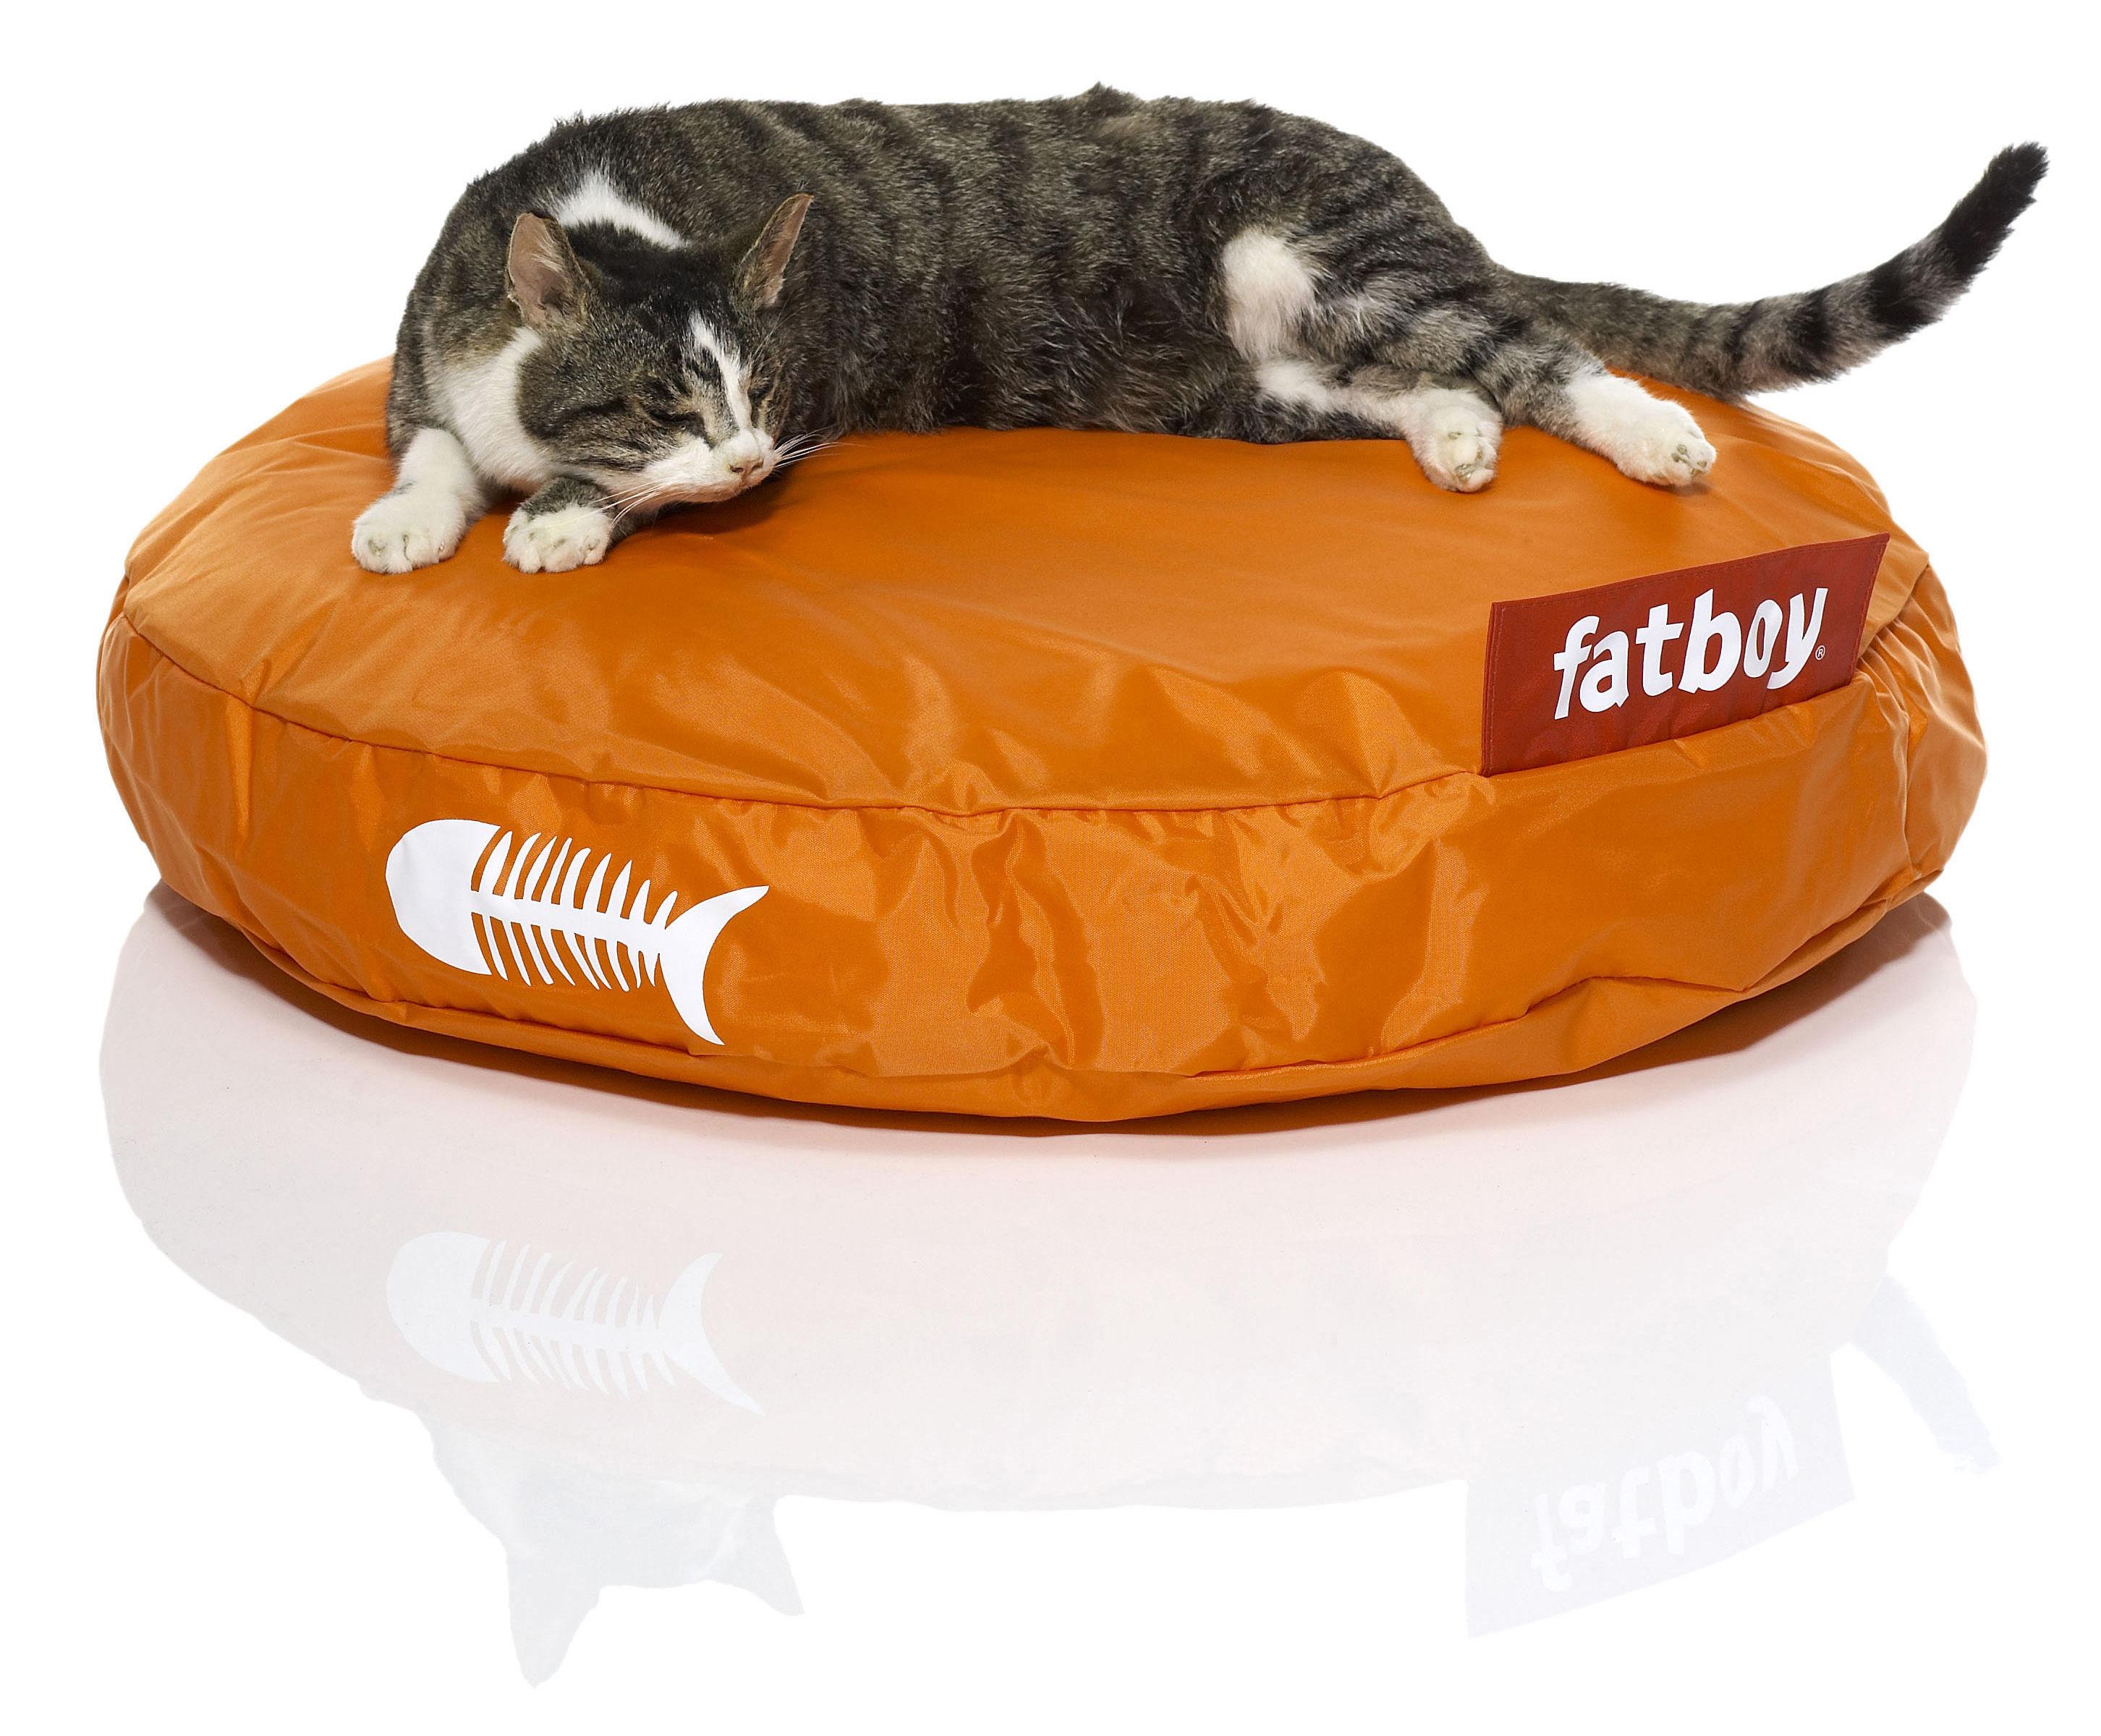 pouf catbag pour chat orange fatboy. Black Bedroom Furniture Sets. Home Design Ideas